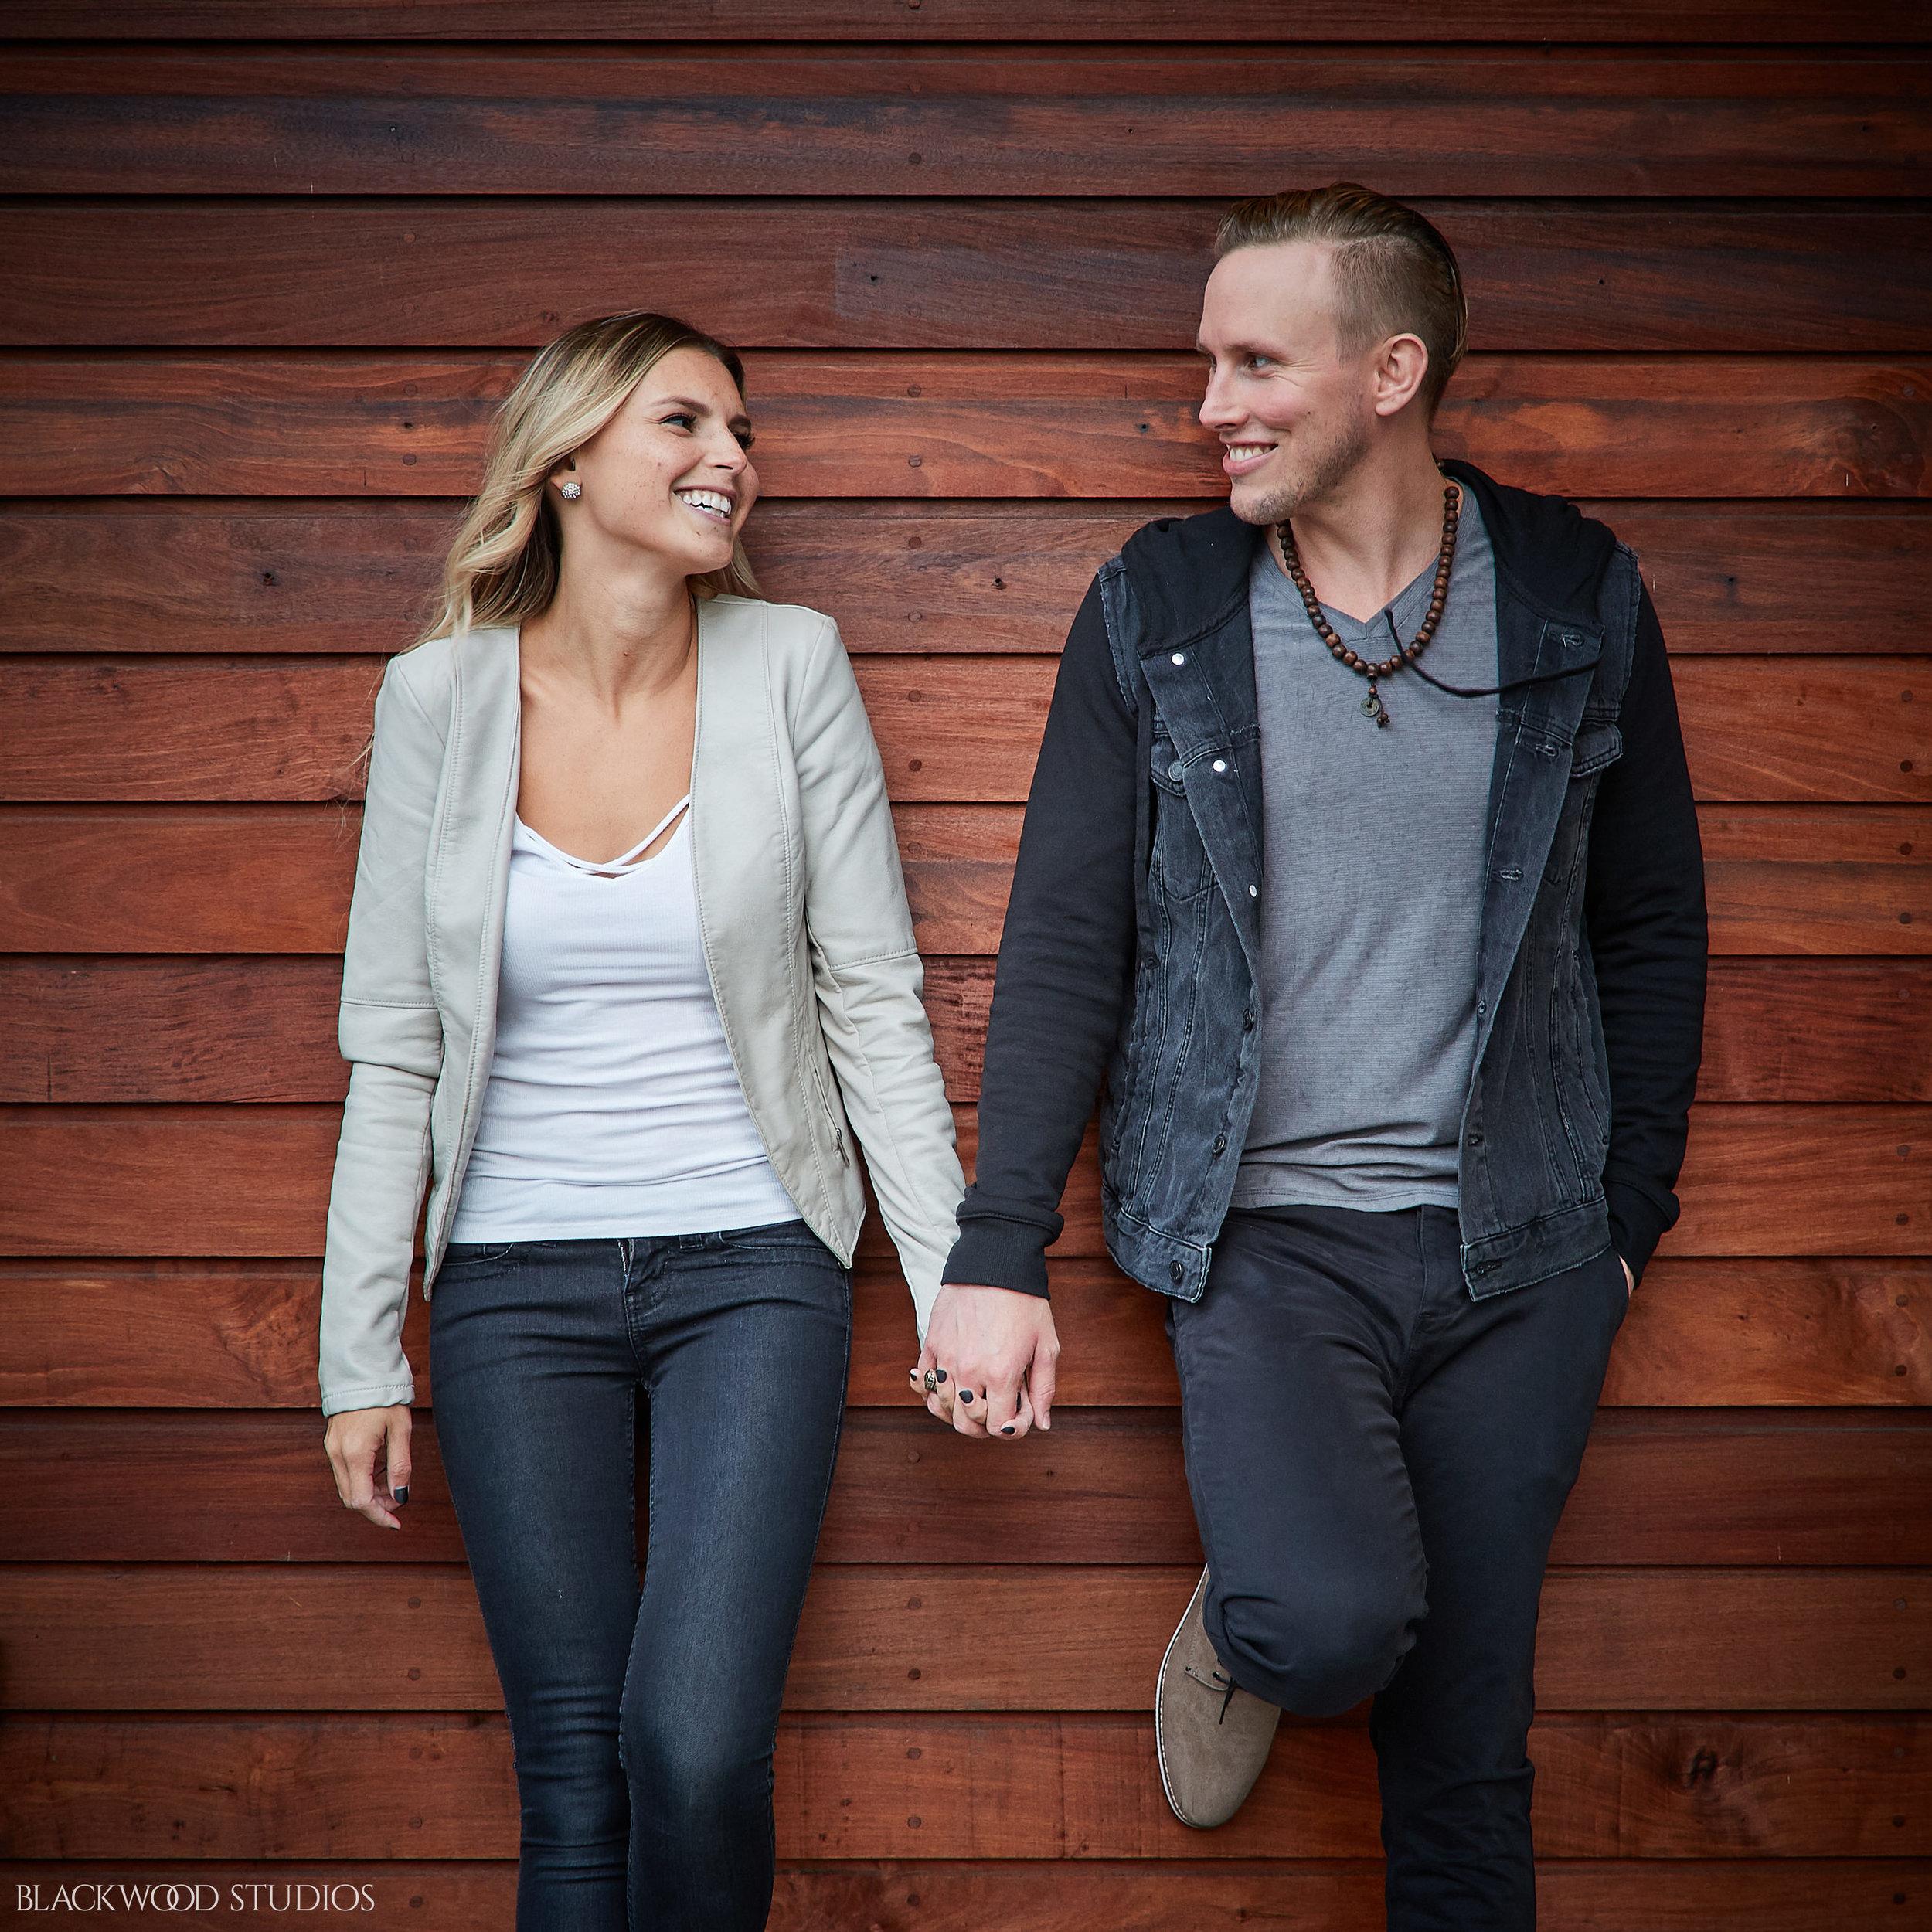 Blackwood-Studios-20181012-180951-Aleisha-and-Brad-Engagement-photography-Toronto-Ontario-Canada-Corktown-Common.jpg